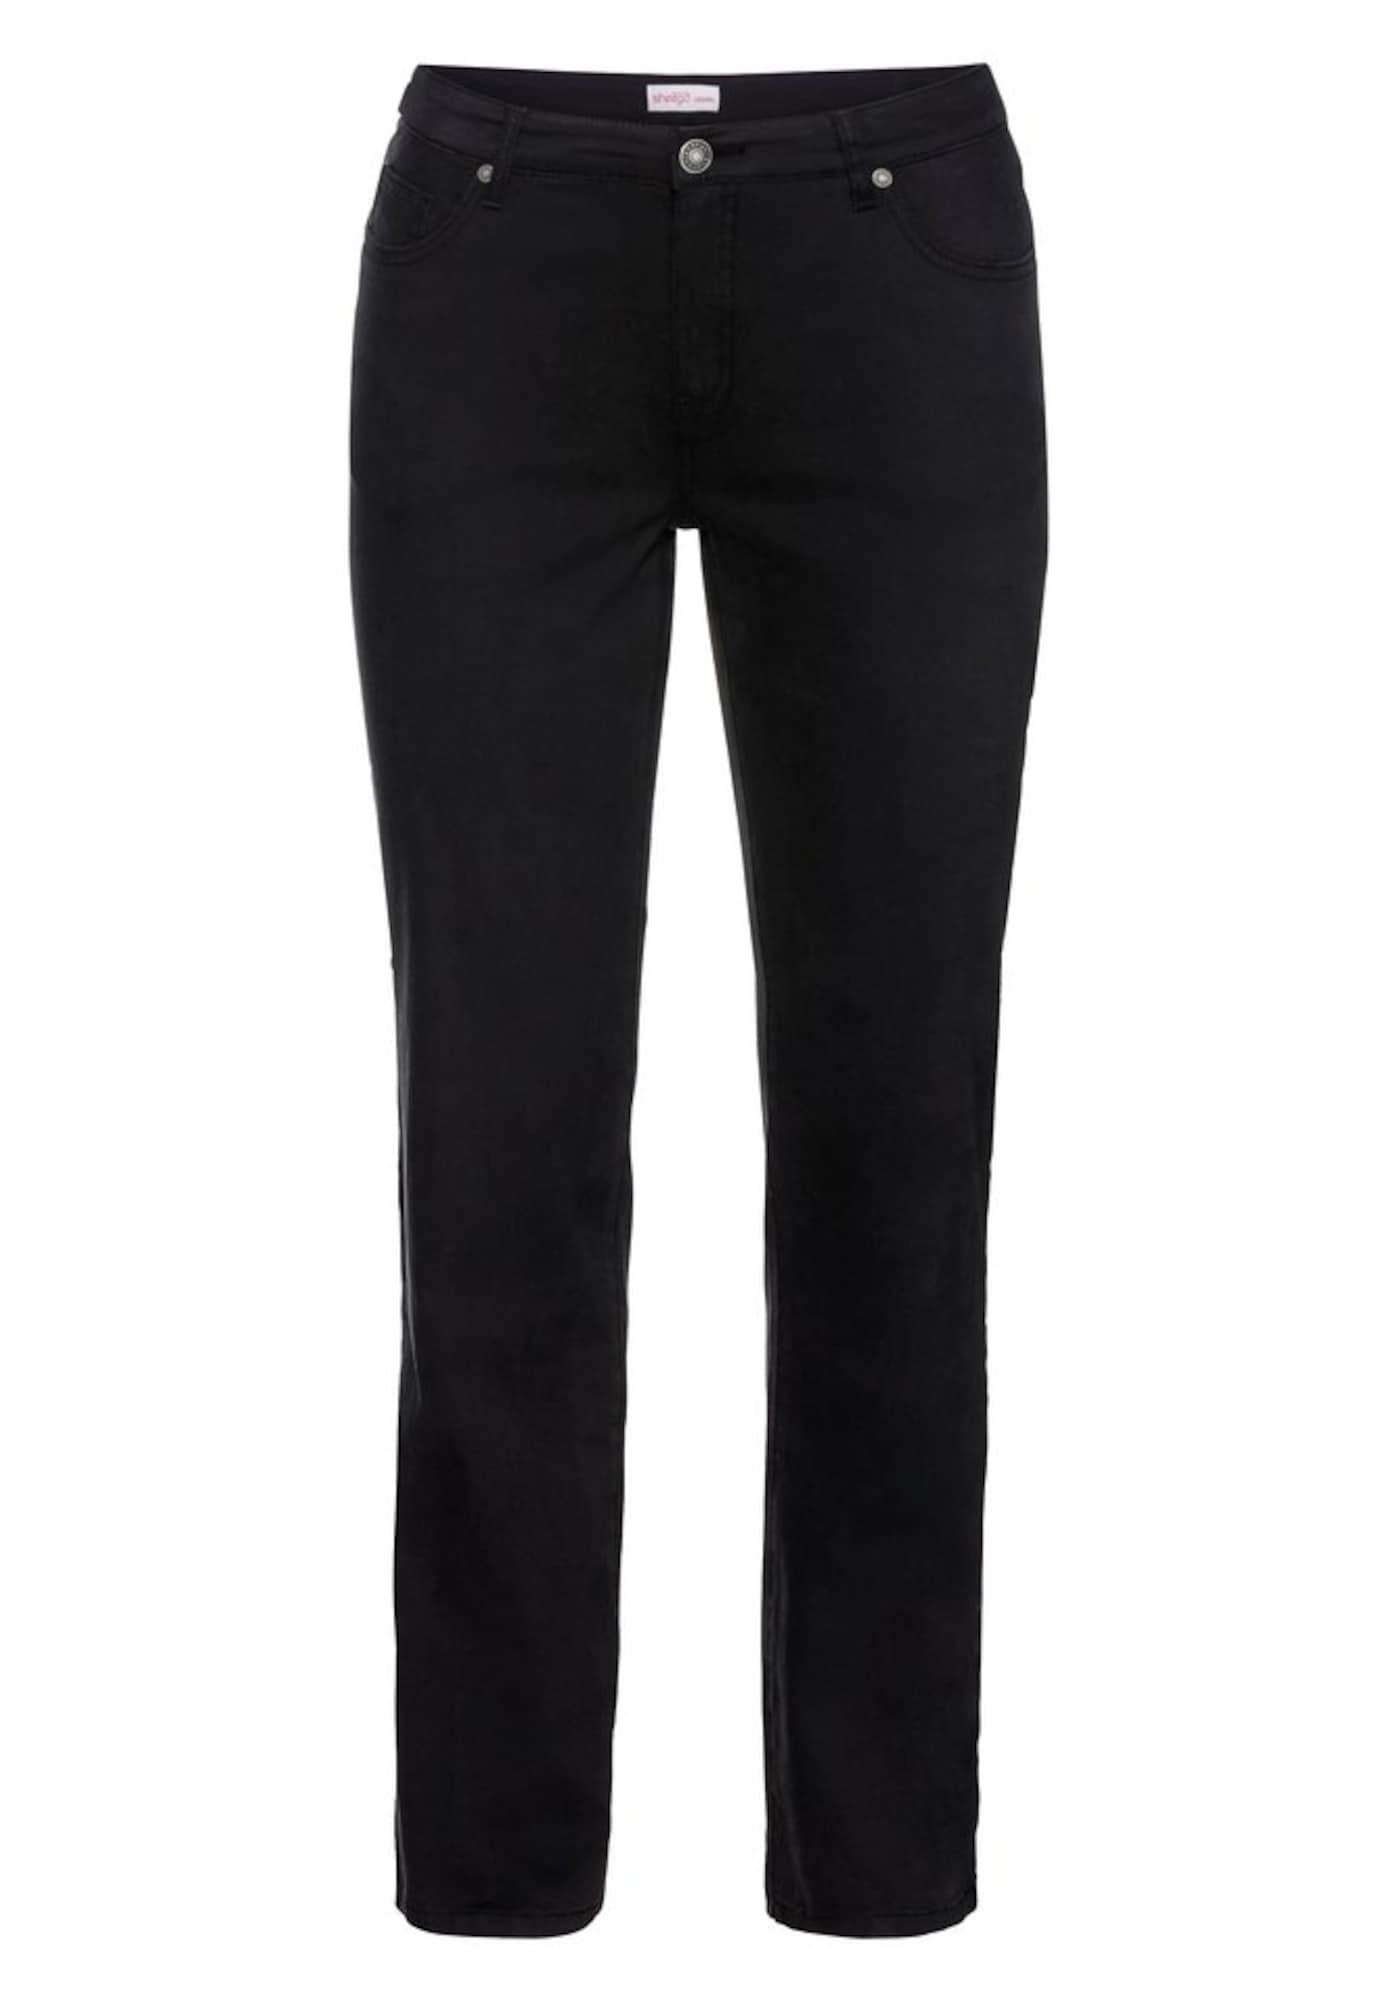 5-Pocket-Hose | Bekleidung > Hosen > 5-Pocket-Hosen | Schwarz | SHEEGO